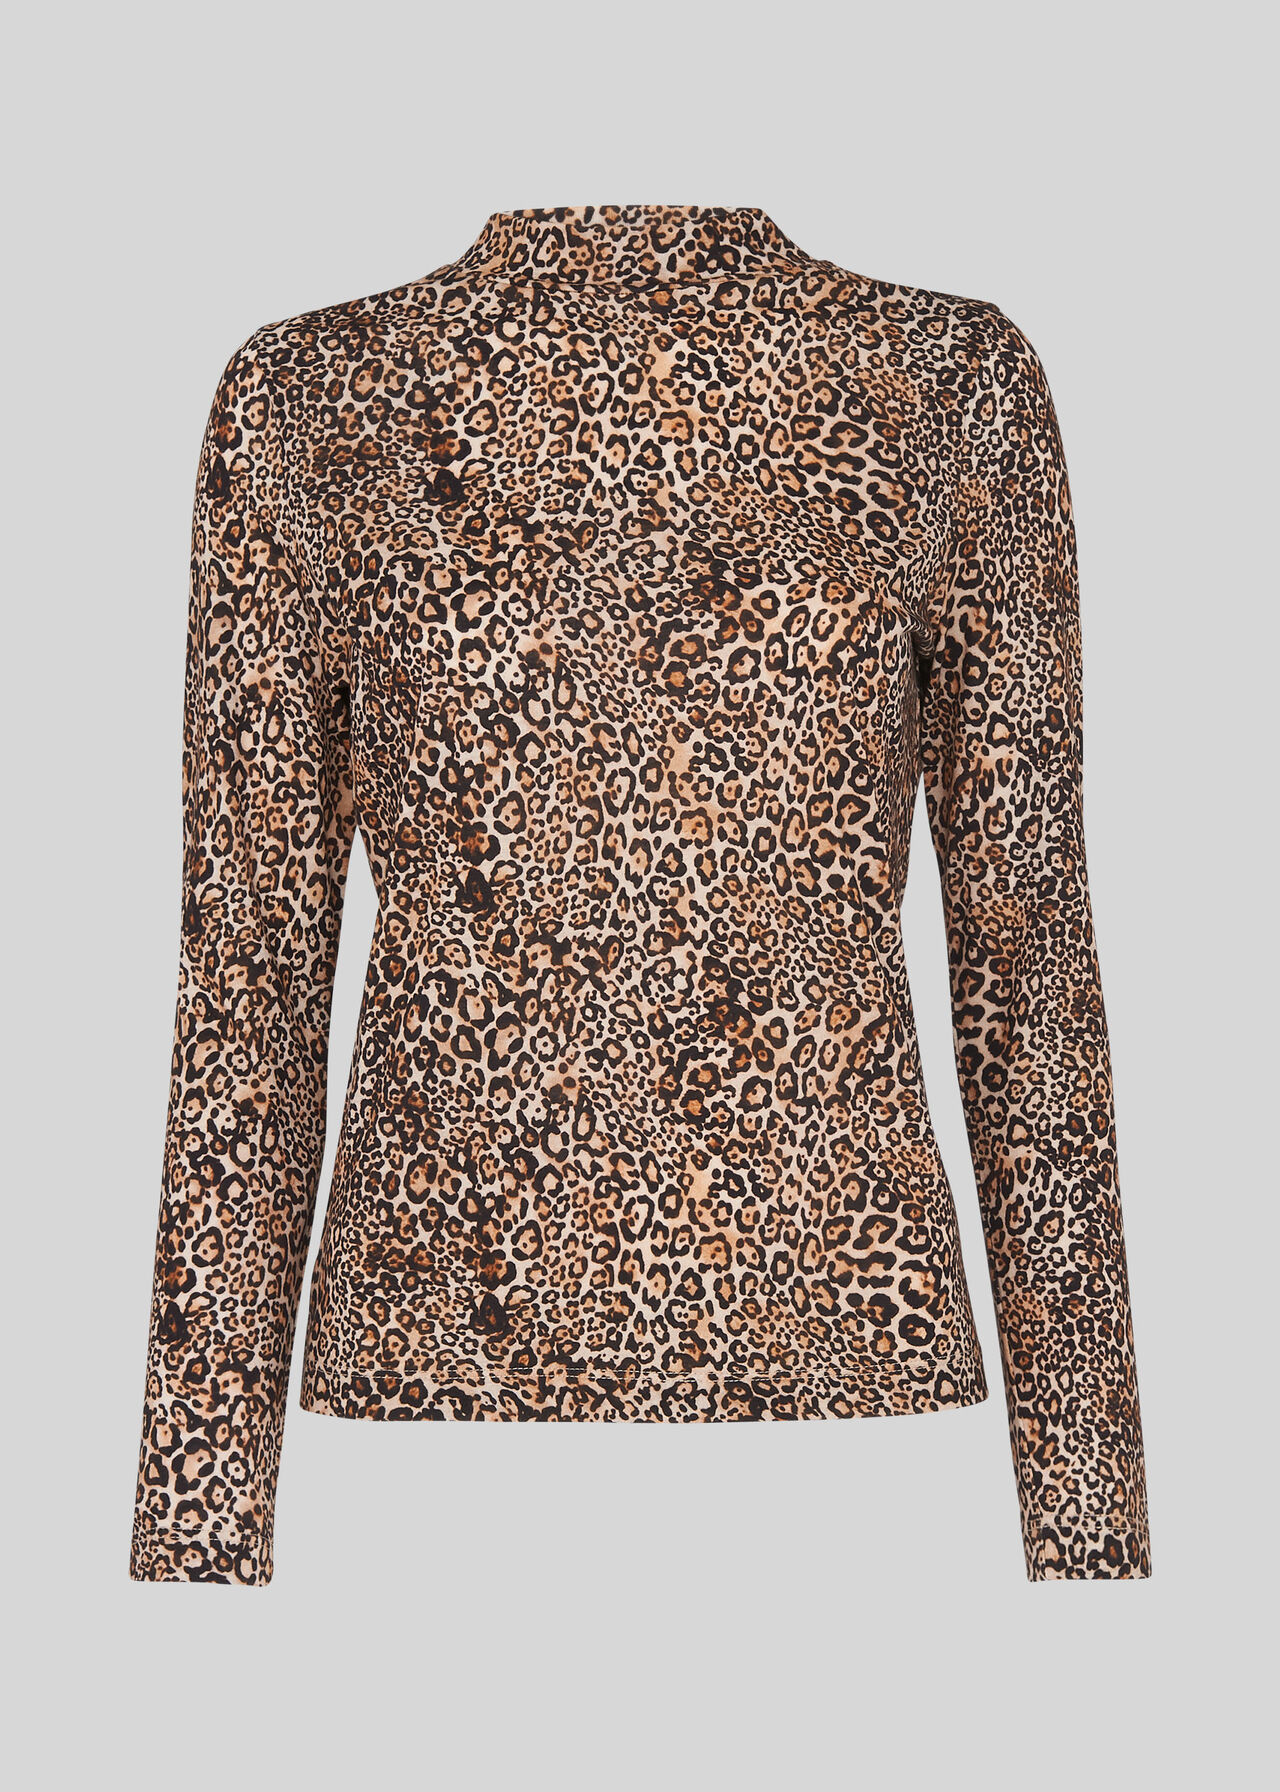 Leopard Print Essential Top Leopard Print